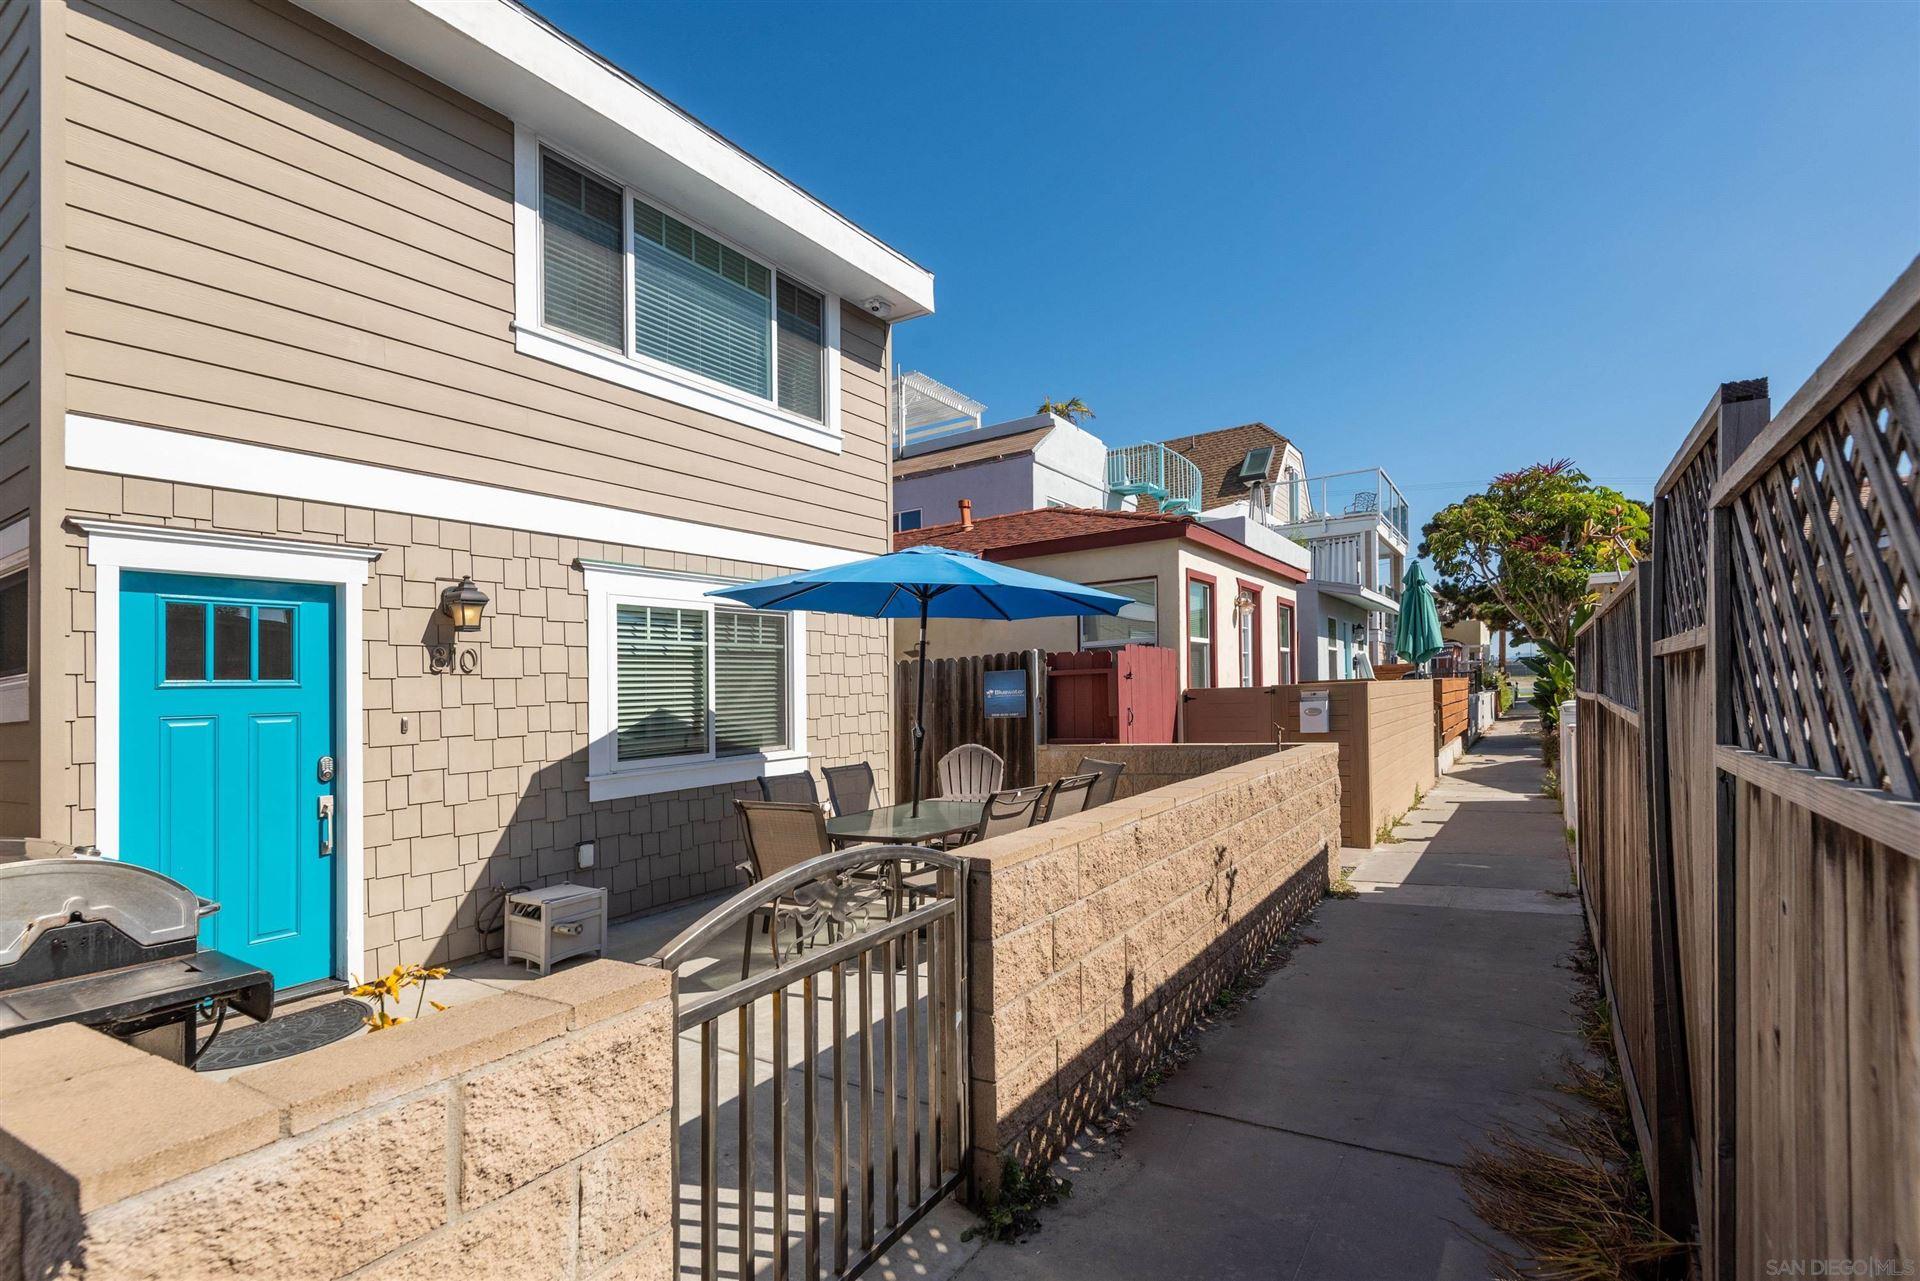 Photo of 810 Pismo, San Diego, CA 92109 (MLS # 210029702)